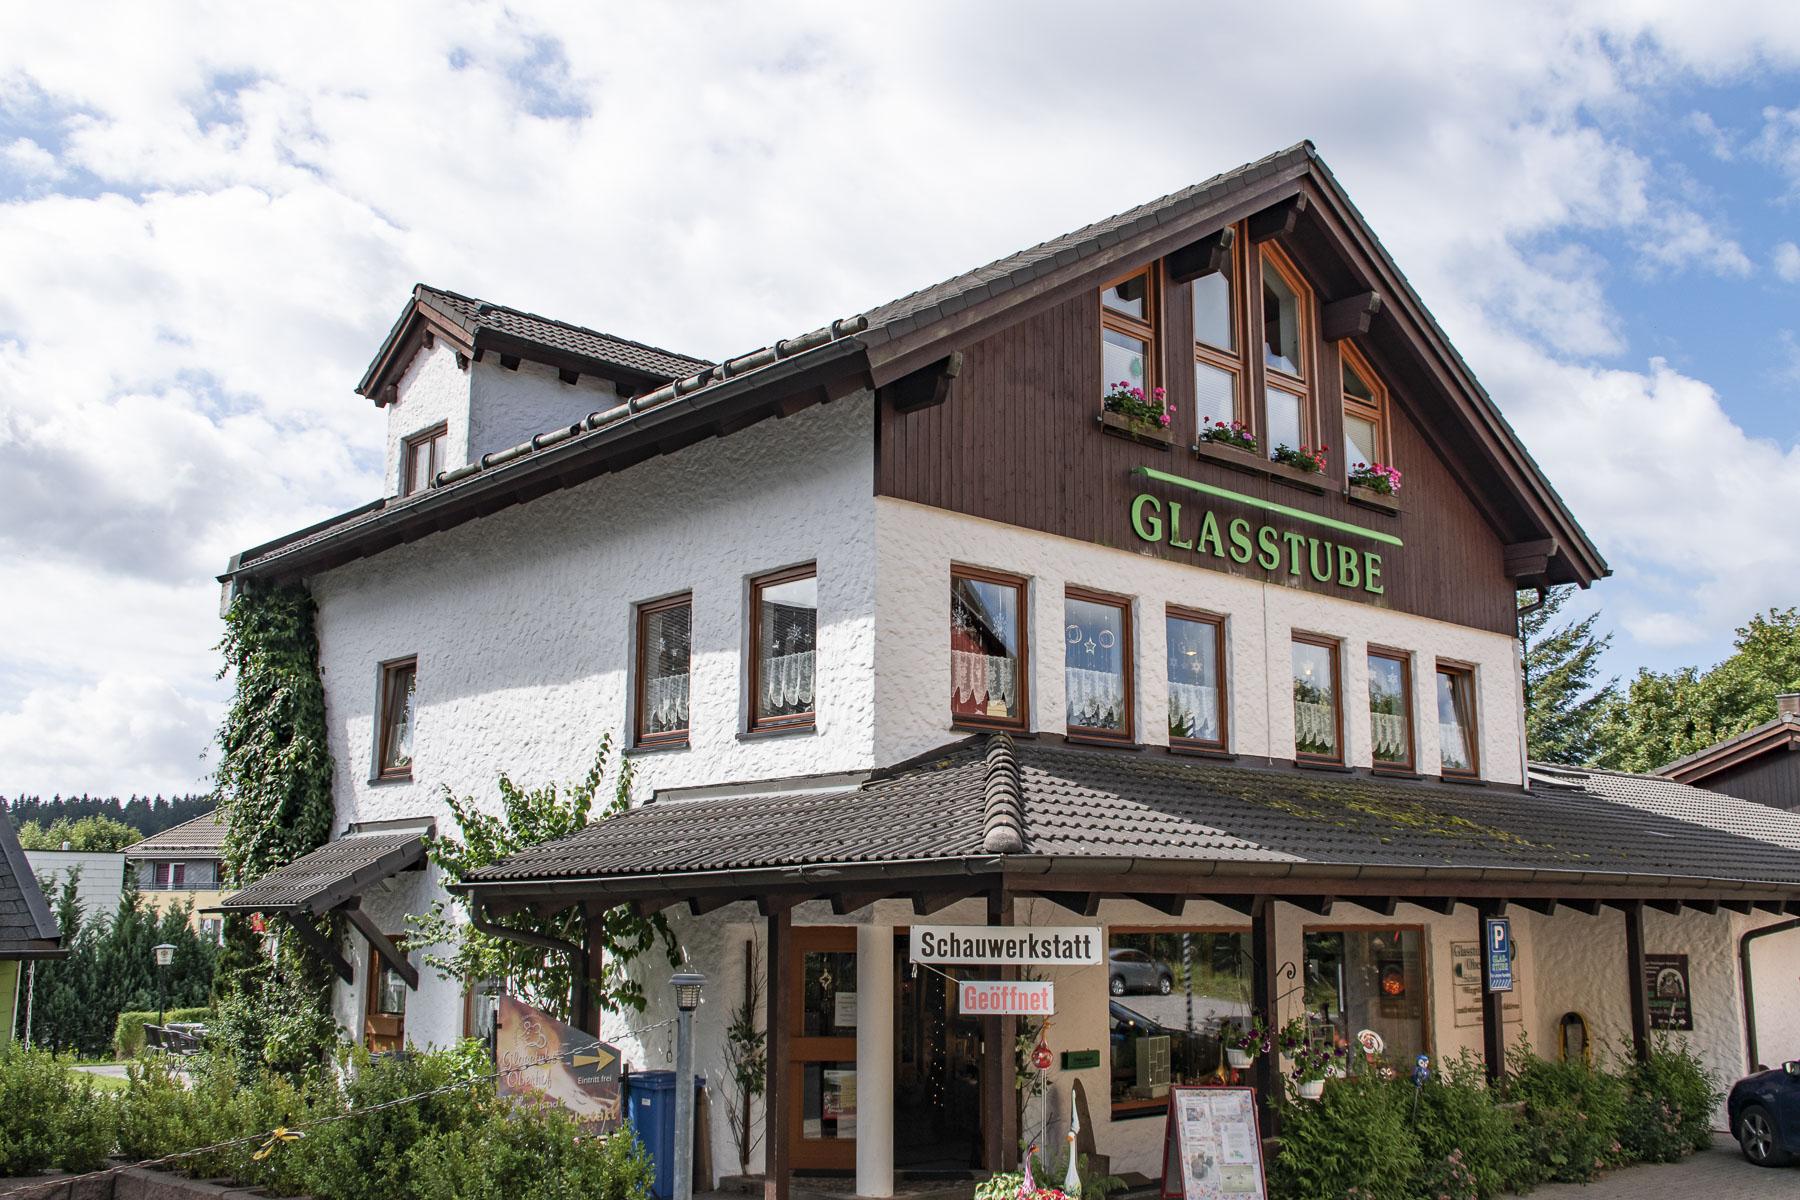 Urlaub in Oberhof Panorama Hotel